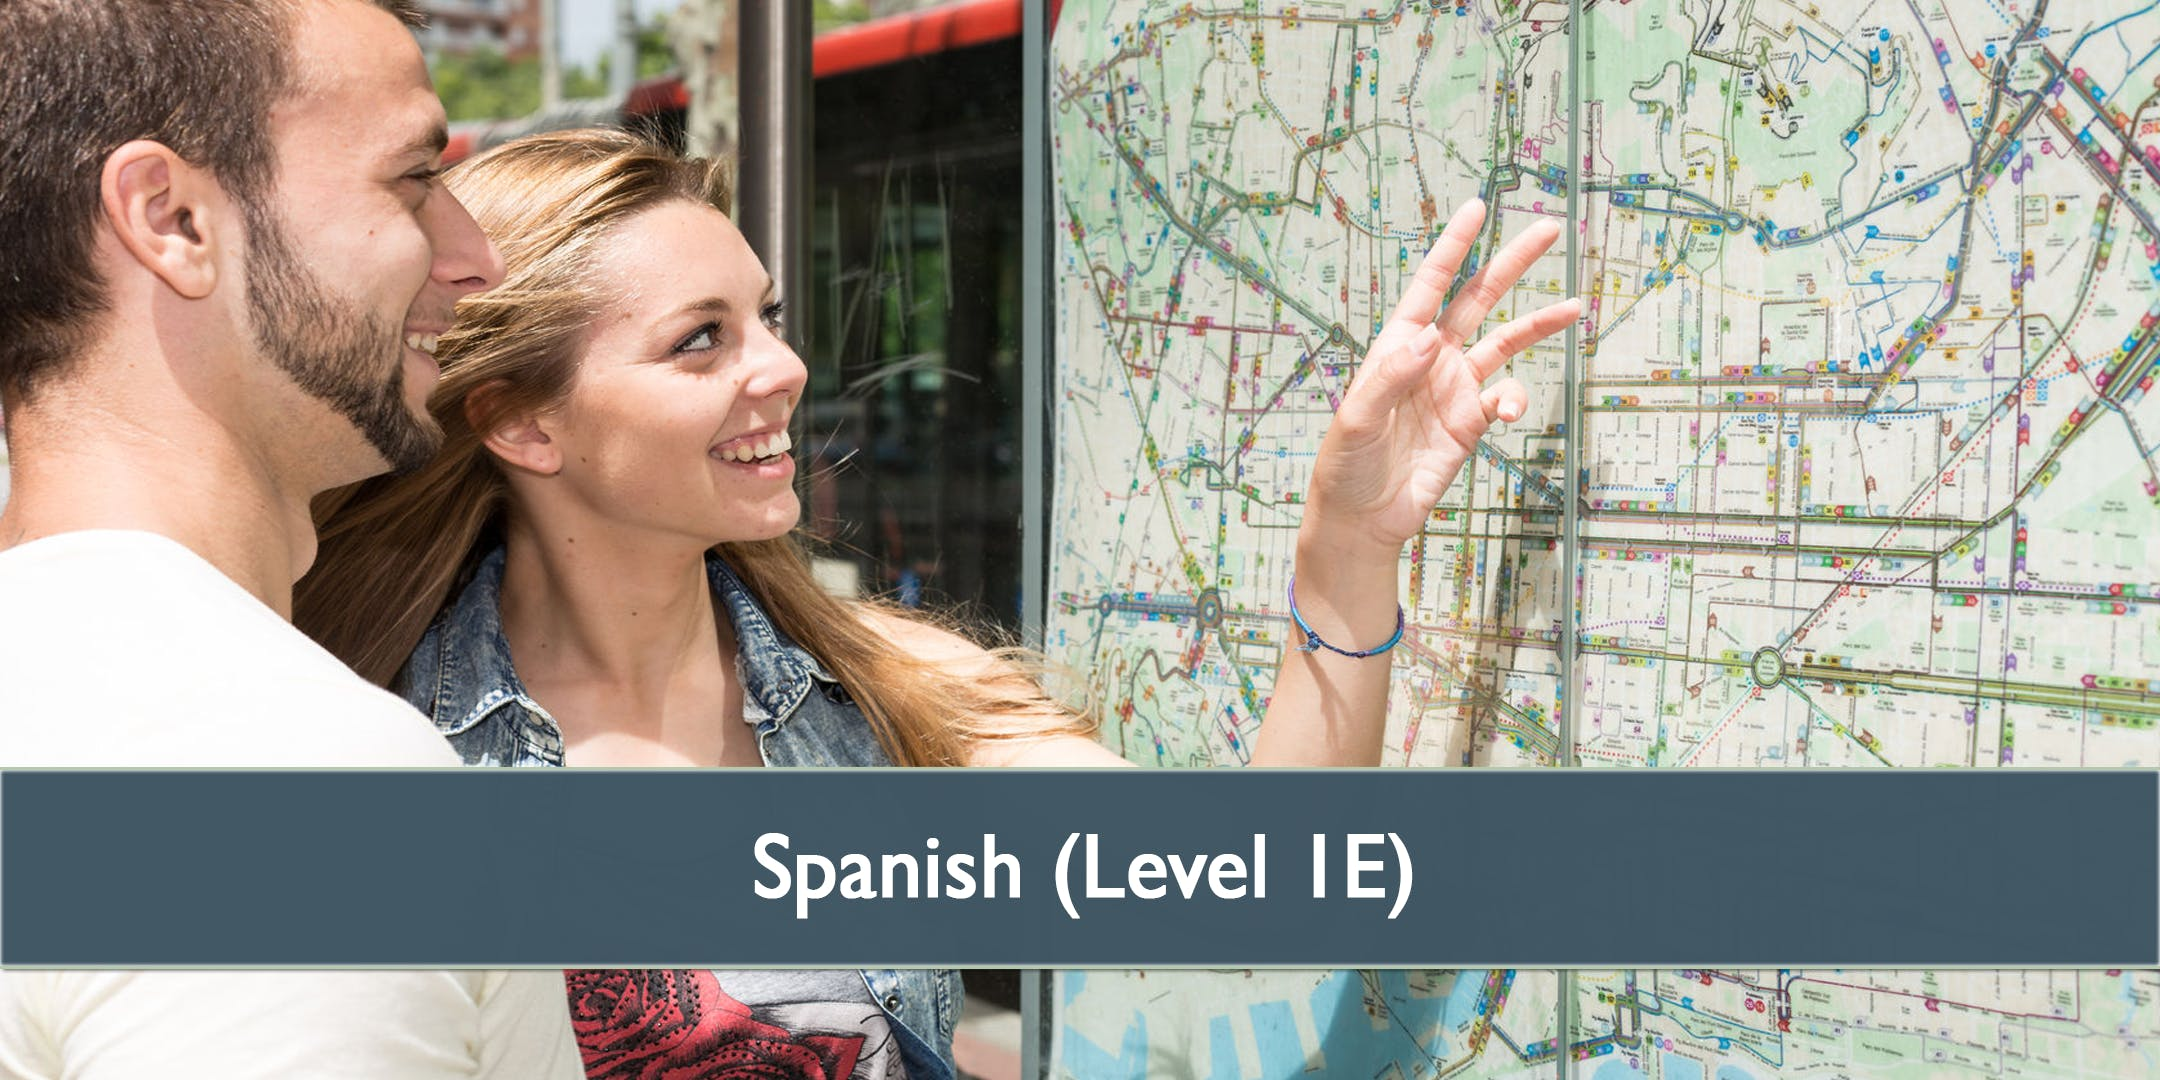 Spanish (Level 1E) - January 2019